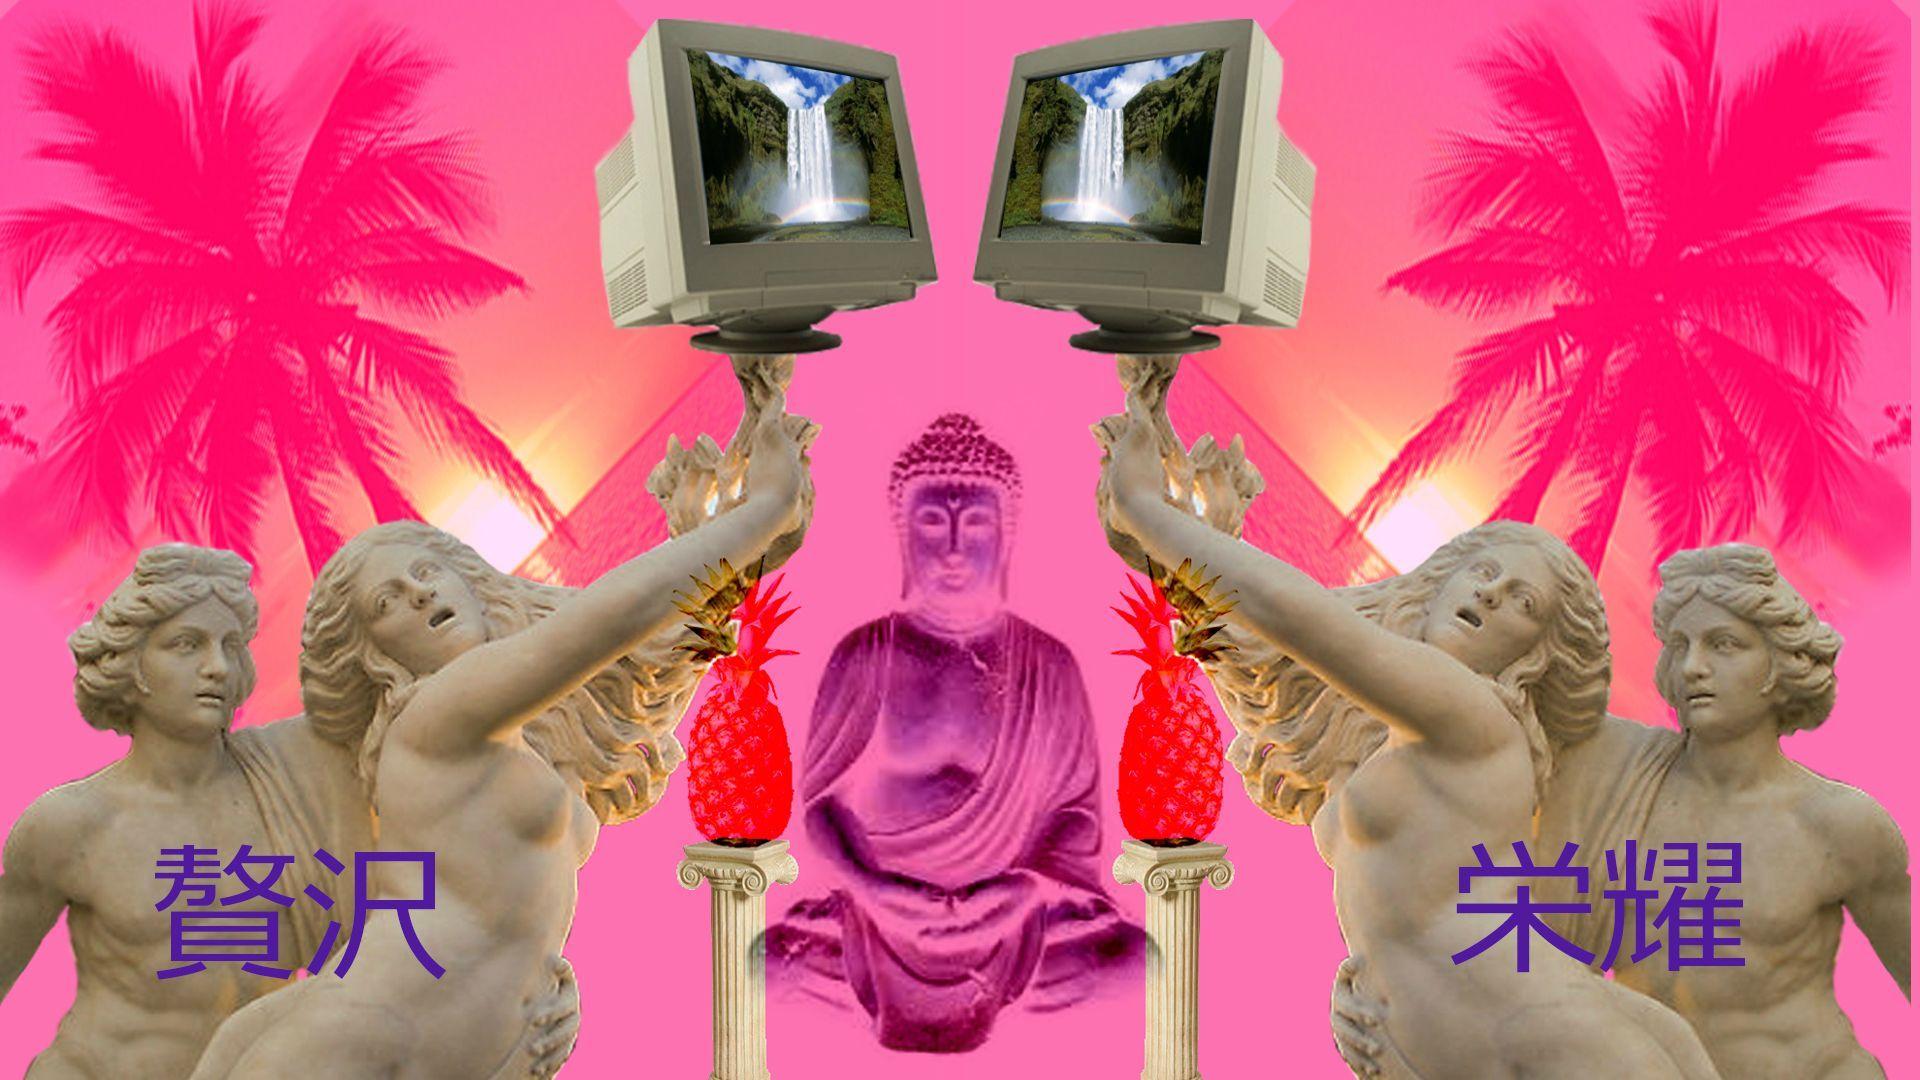 1409537108892.jpg (1920×1200) | vaporwave + seapunk | Pinterest ...